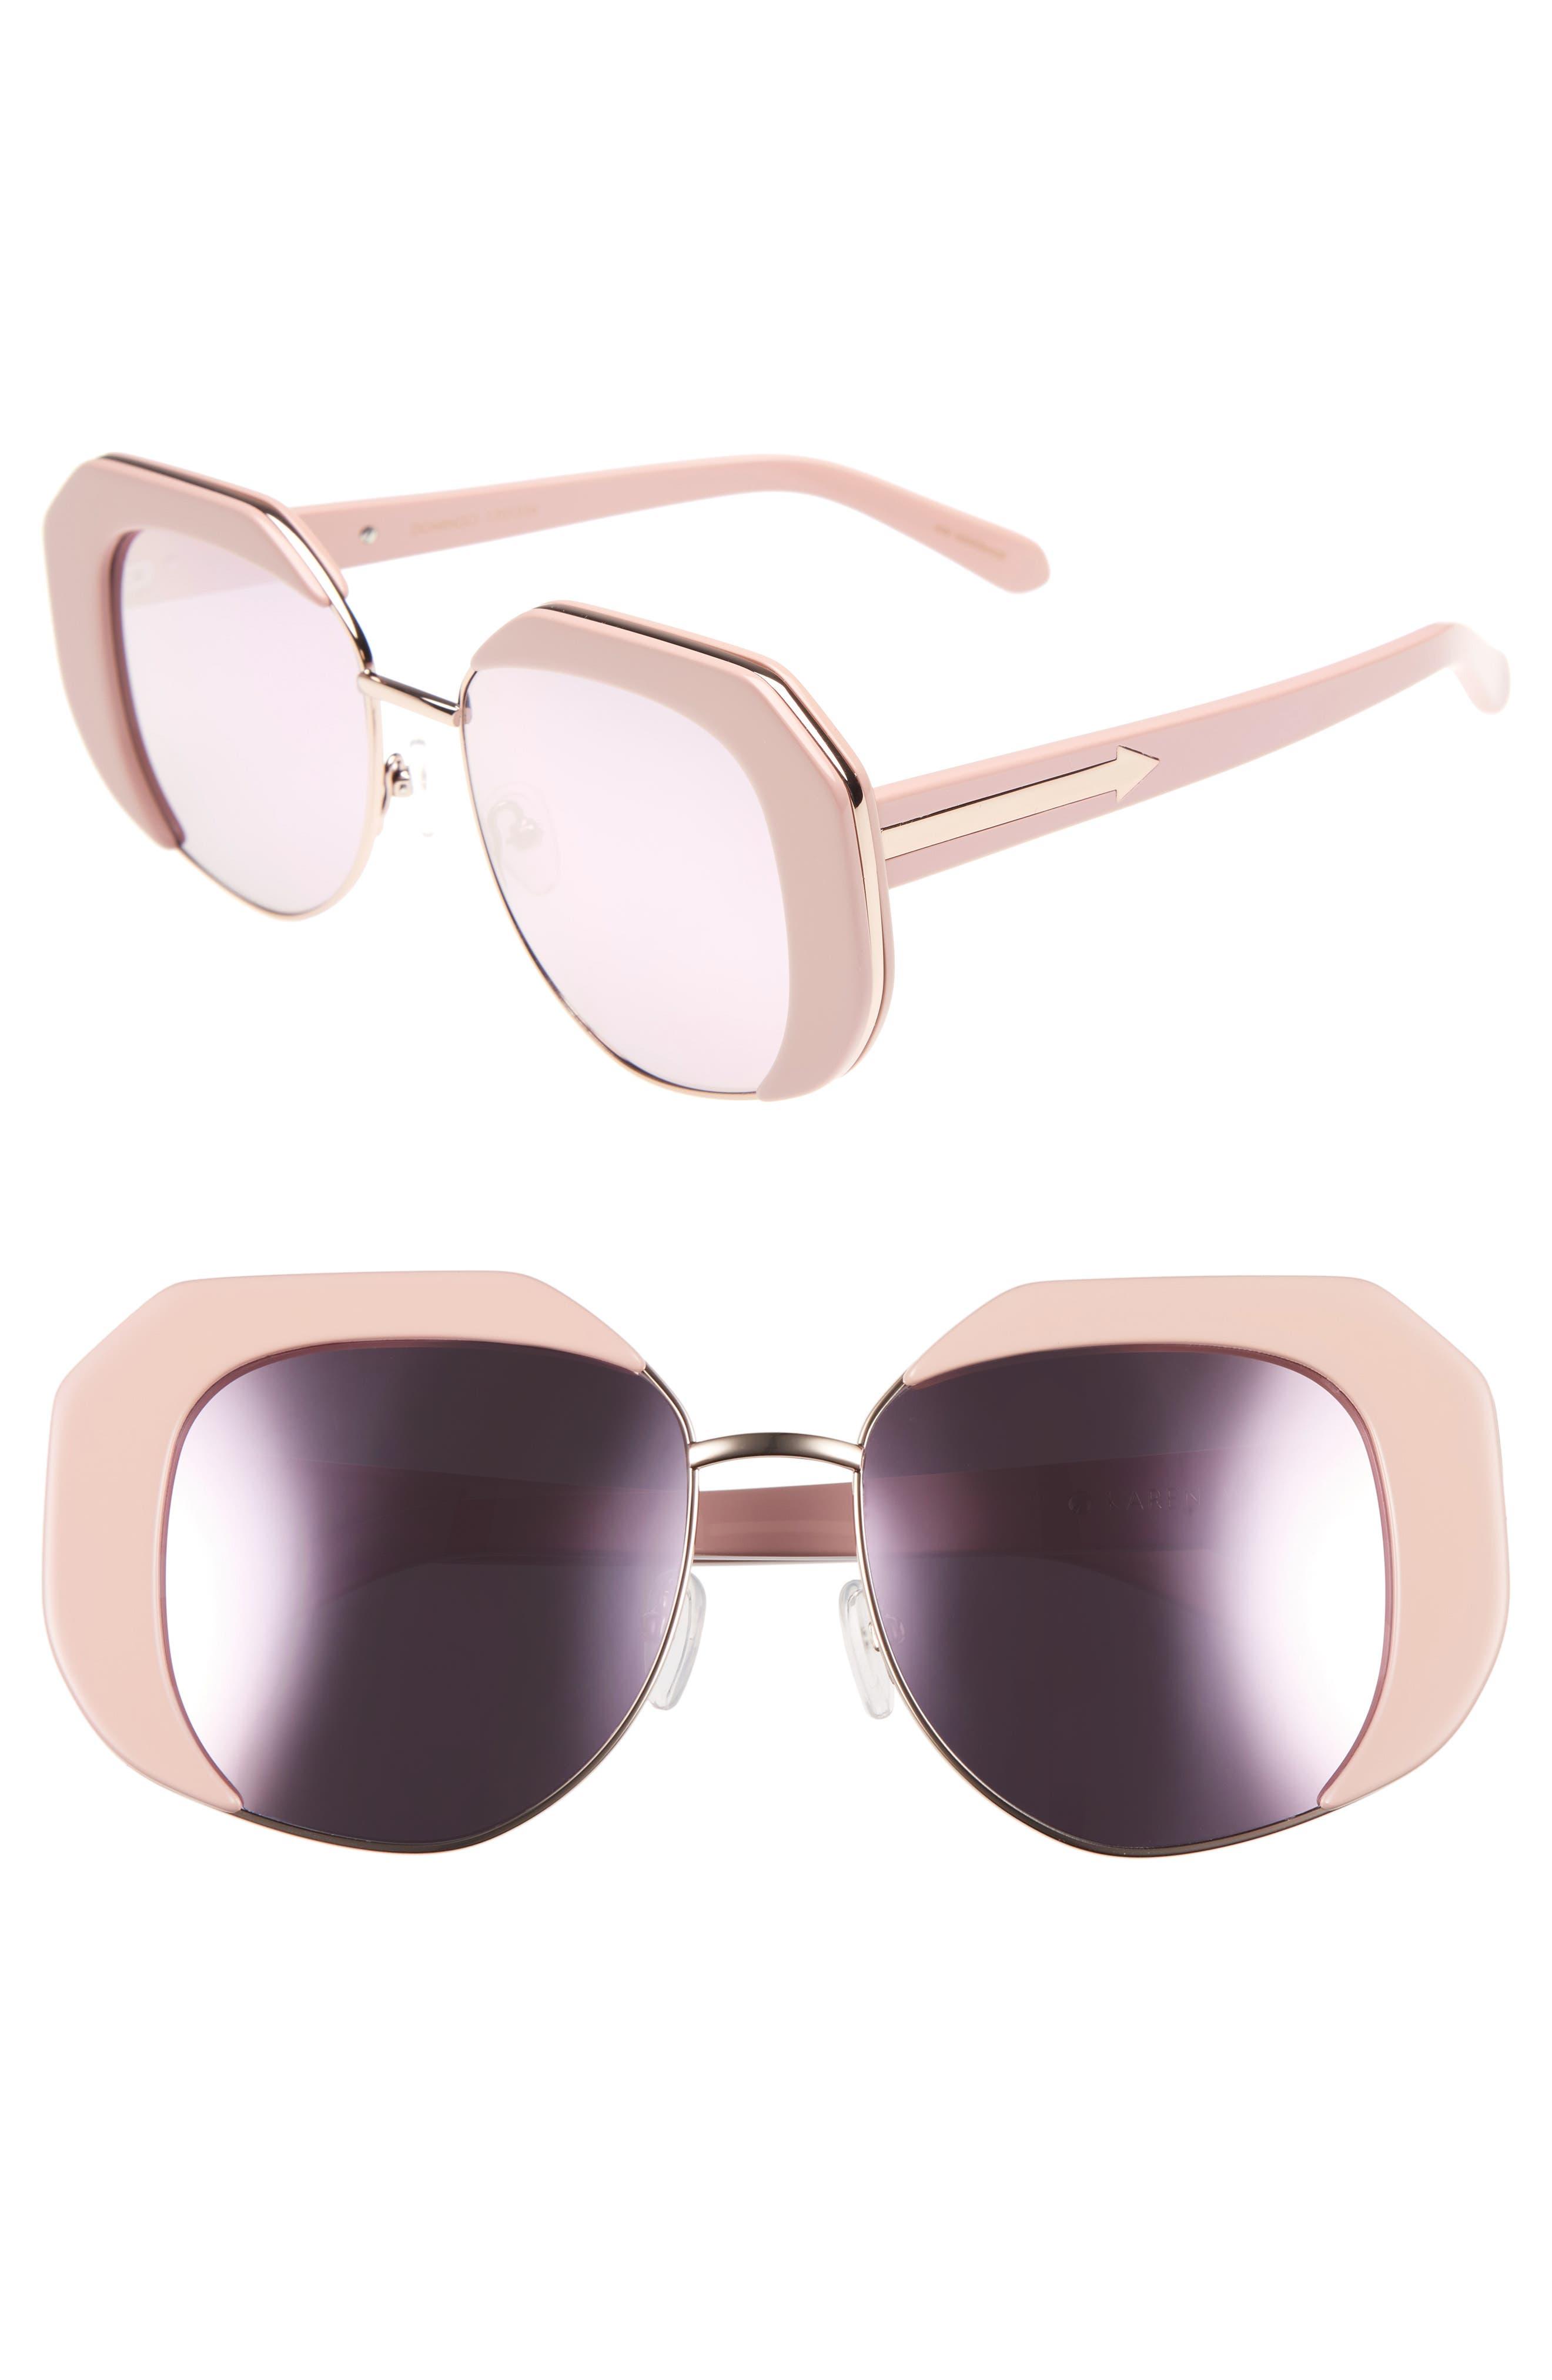 Domingo 52mm Sunglasses,                         Main,                         color, Pink/ Rose Gold